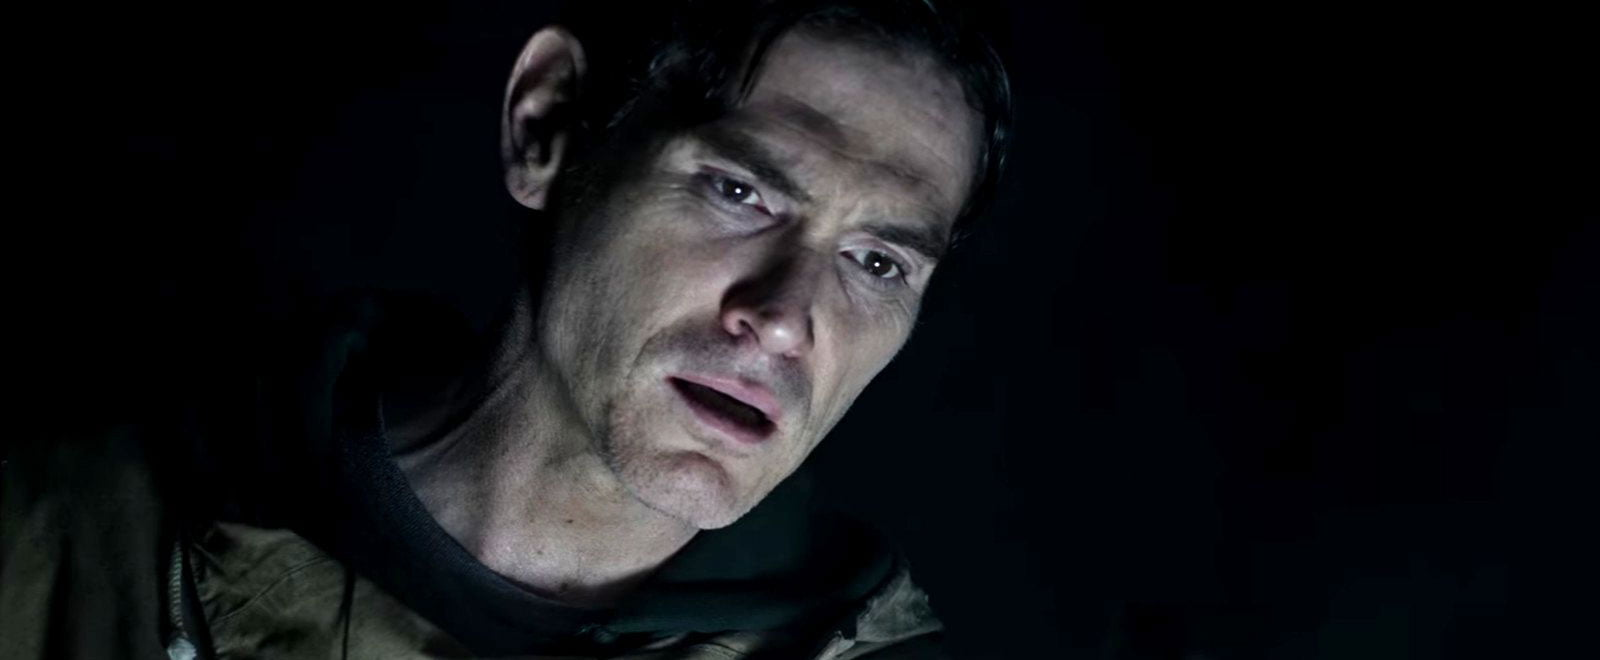 Біллі Крудап | Чужий: Заповіт / Alien: Covenant (2017)